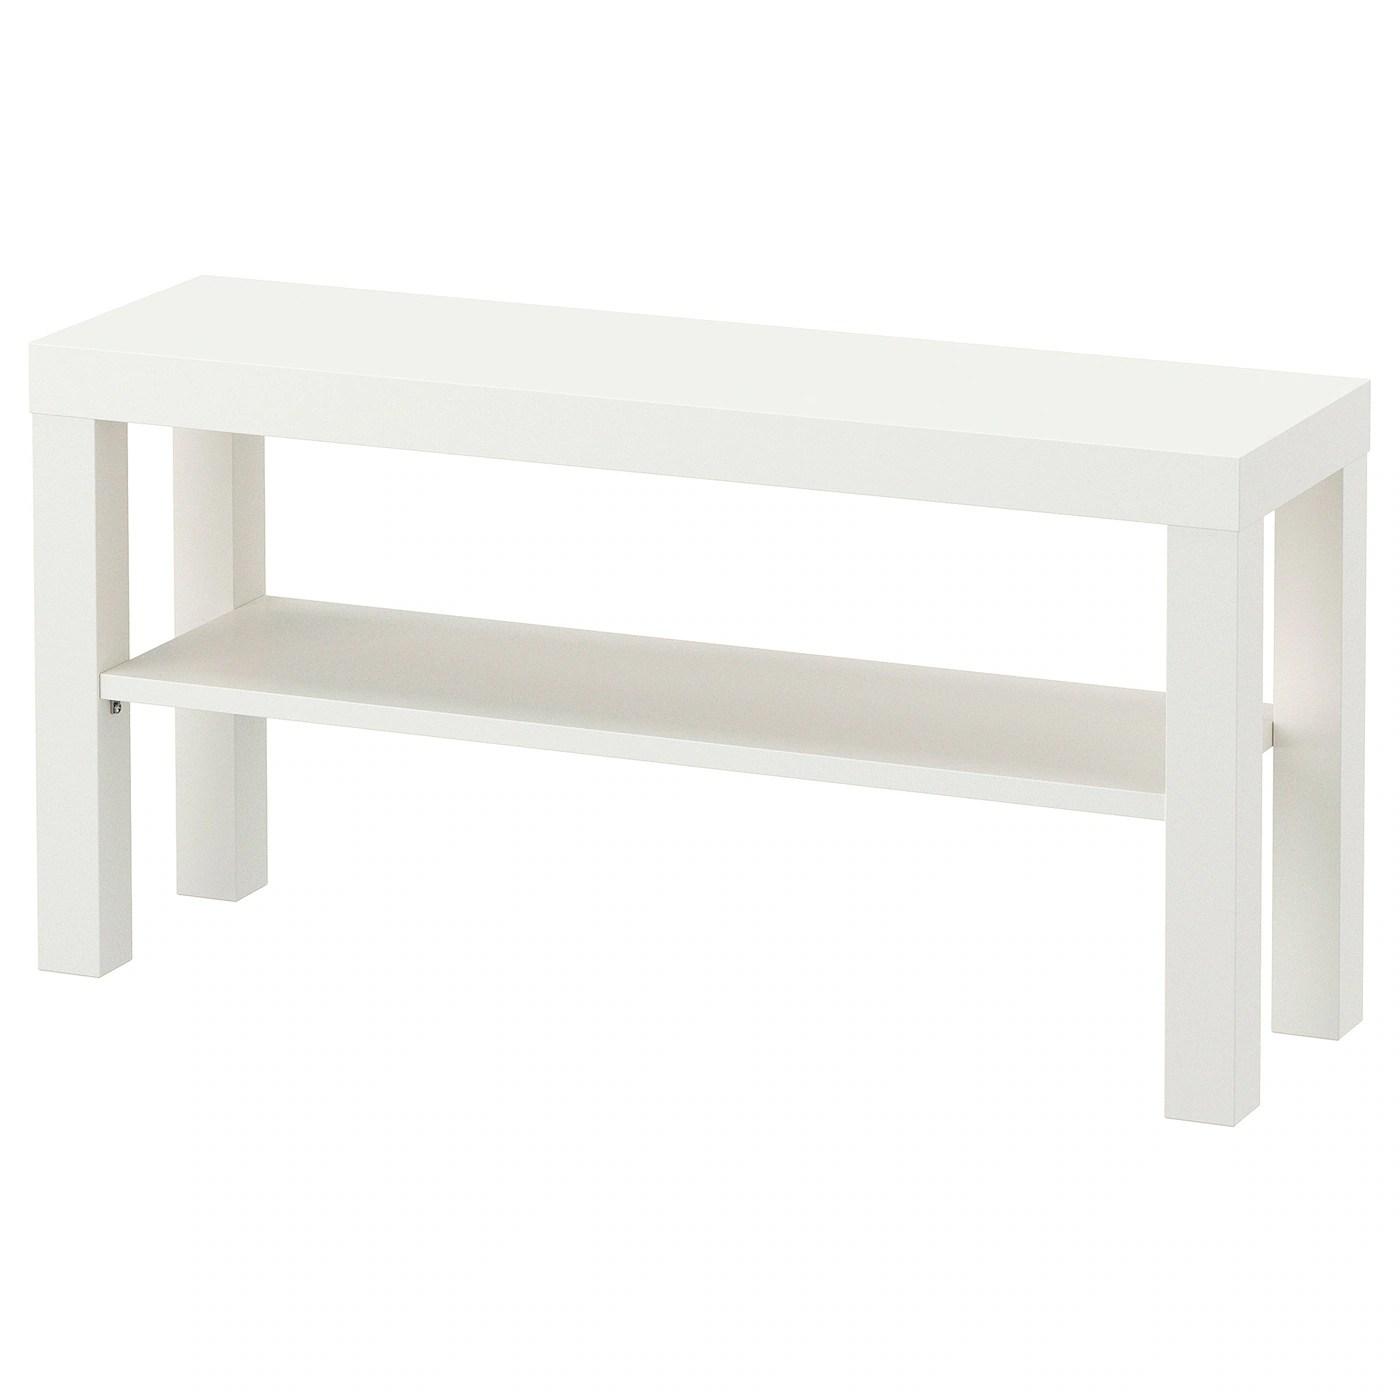 Lack White Tv Bench 90x26x45 Cm Ikea